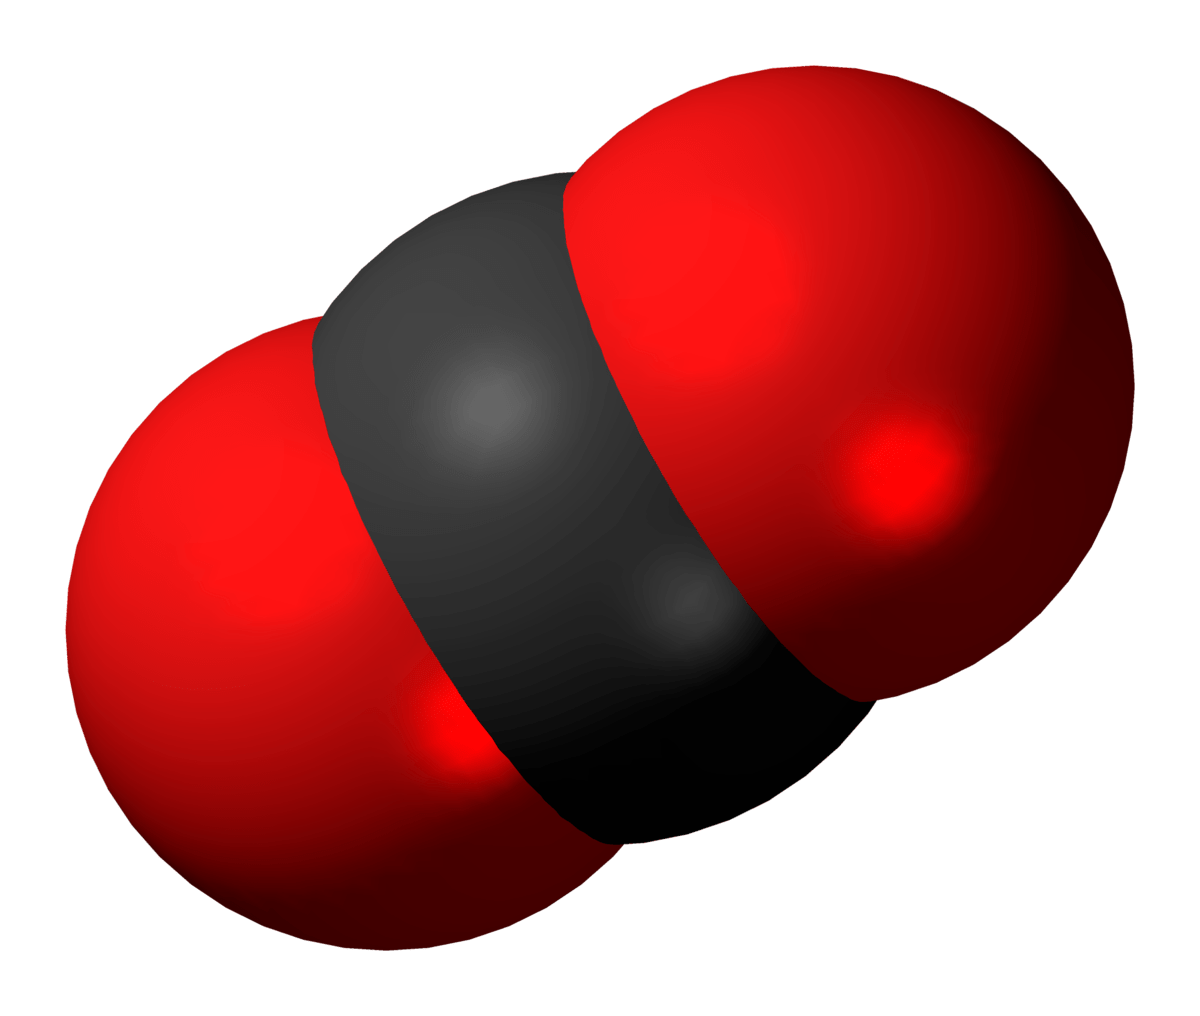 co2 covalent bond diagram 5 pin switch wiring ثنائي أكسيد الكربون ويكيبيديا الموسوعة الحرة